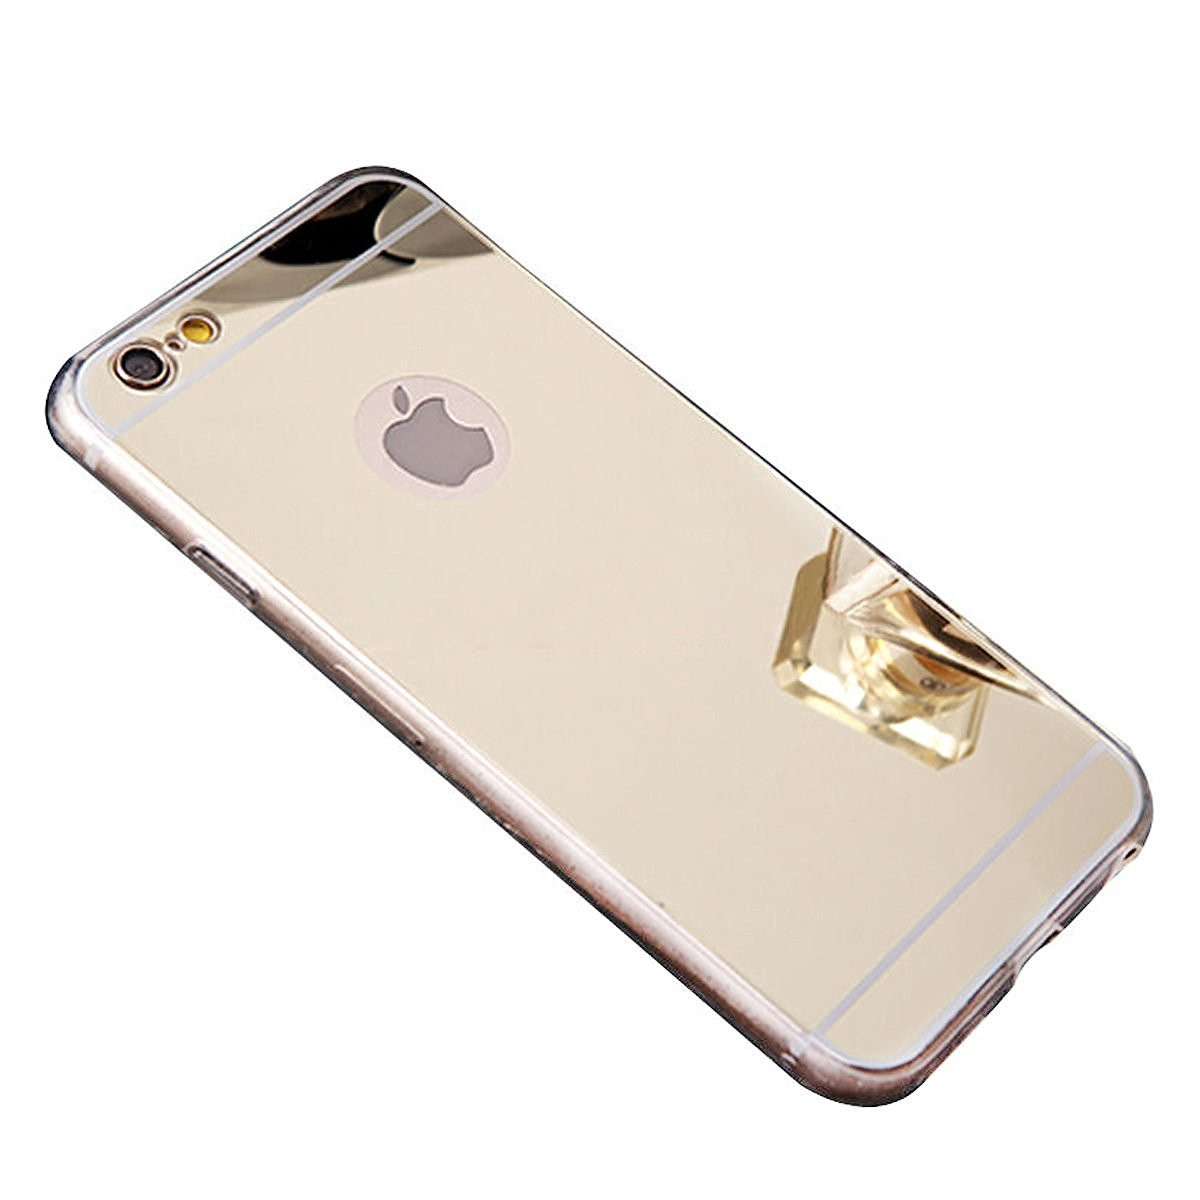 Apple iPhone 7 Plus Case 3f1c13d55d